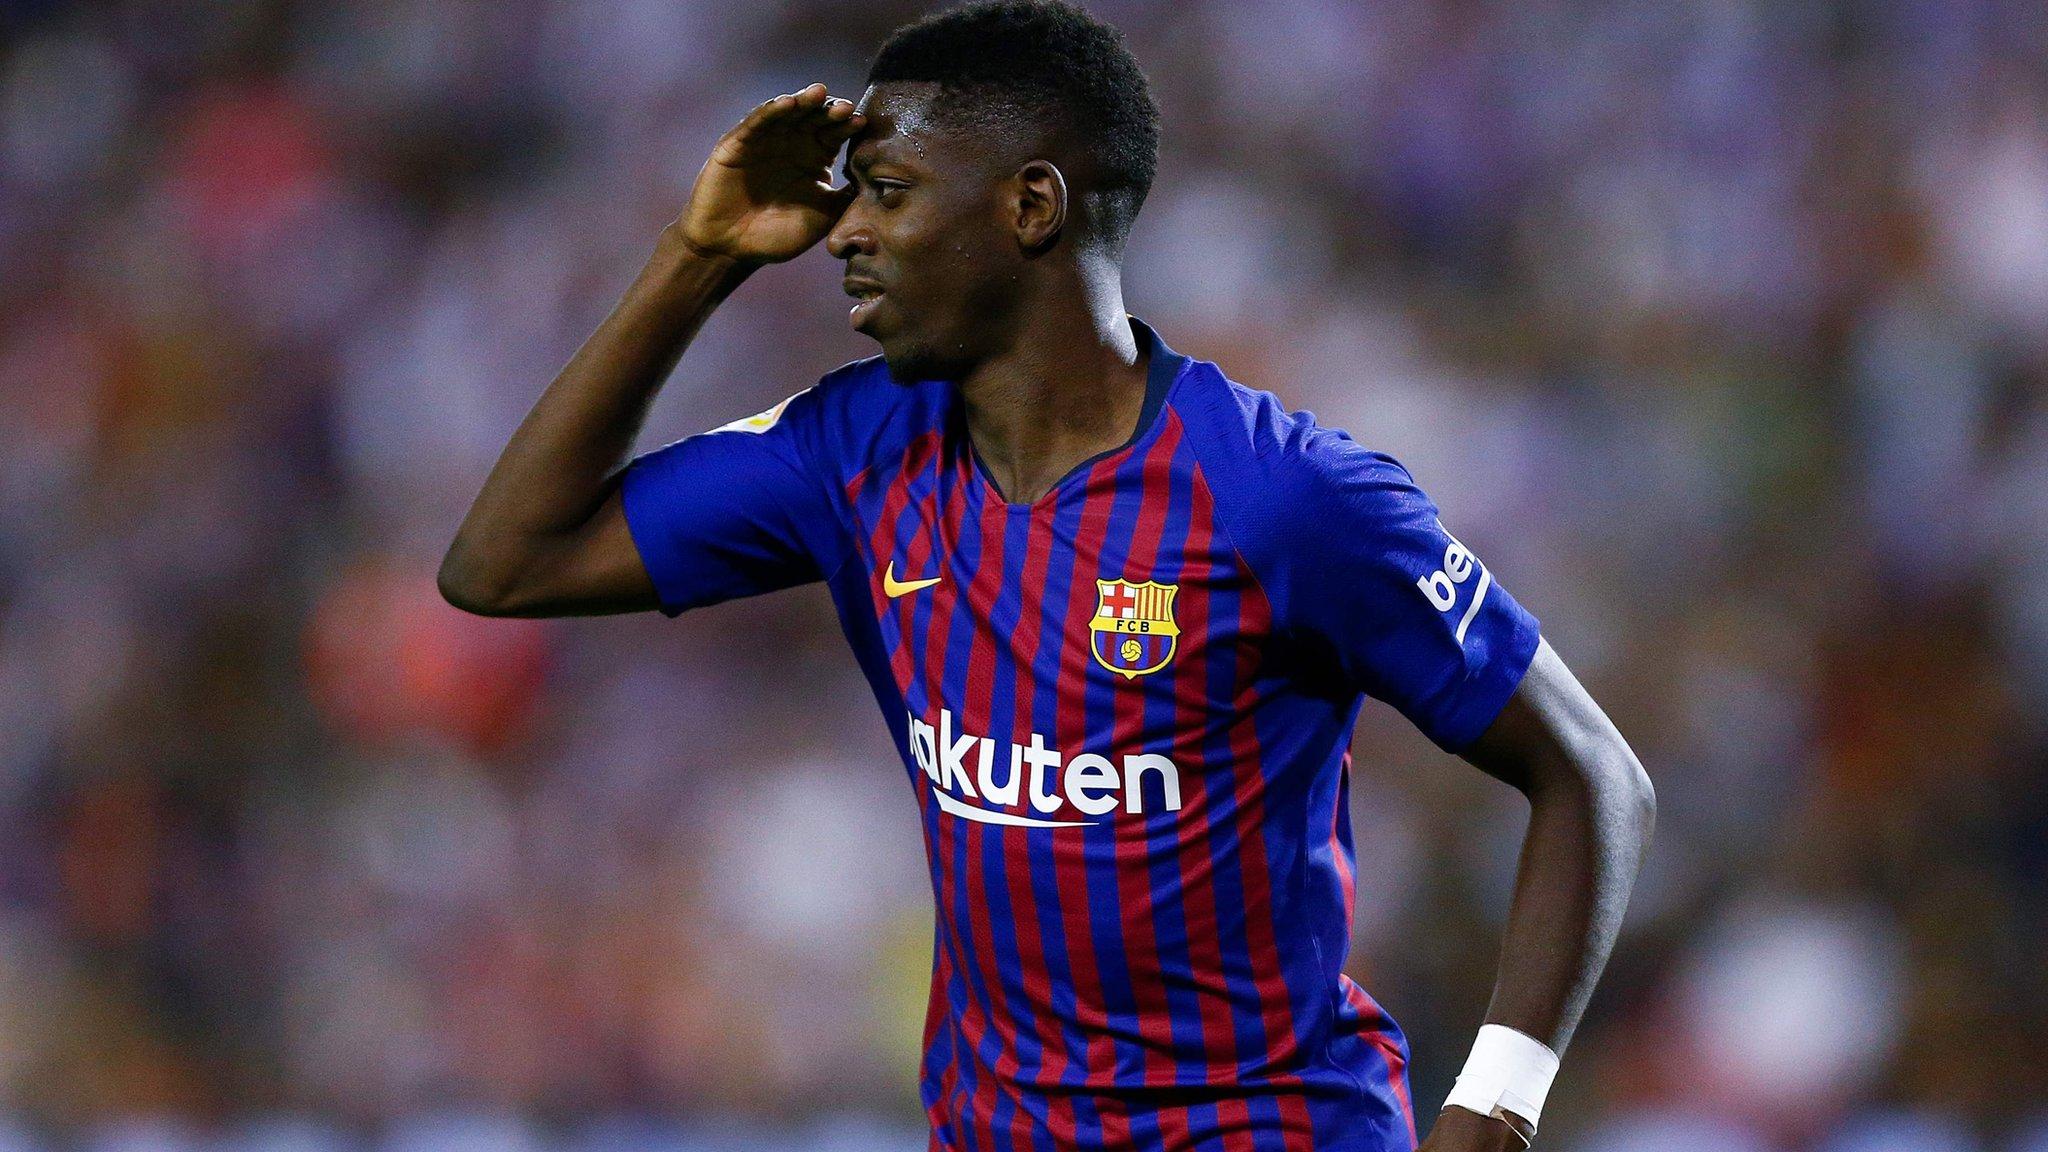 Dembele scores winner as Barcelona get late VAR reprieve